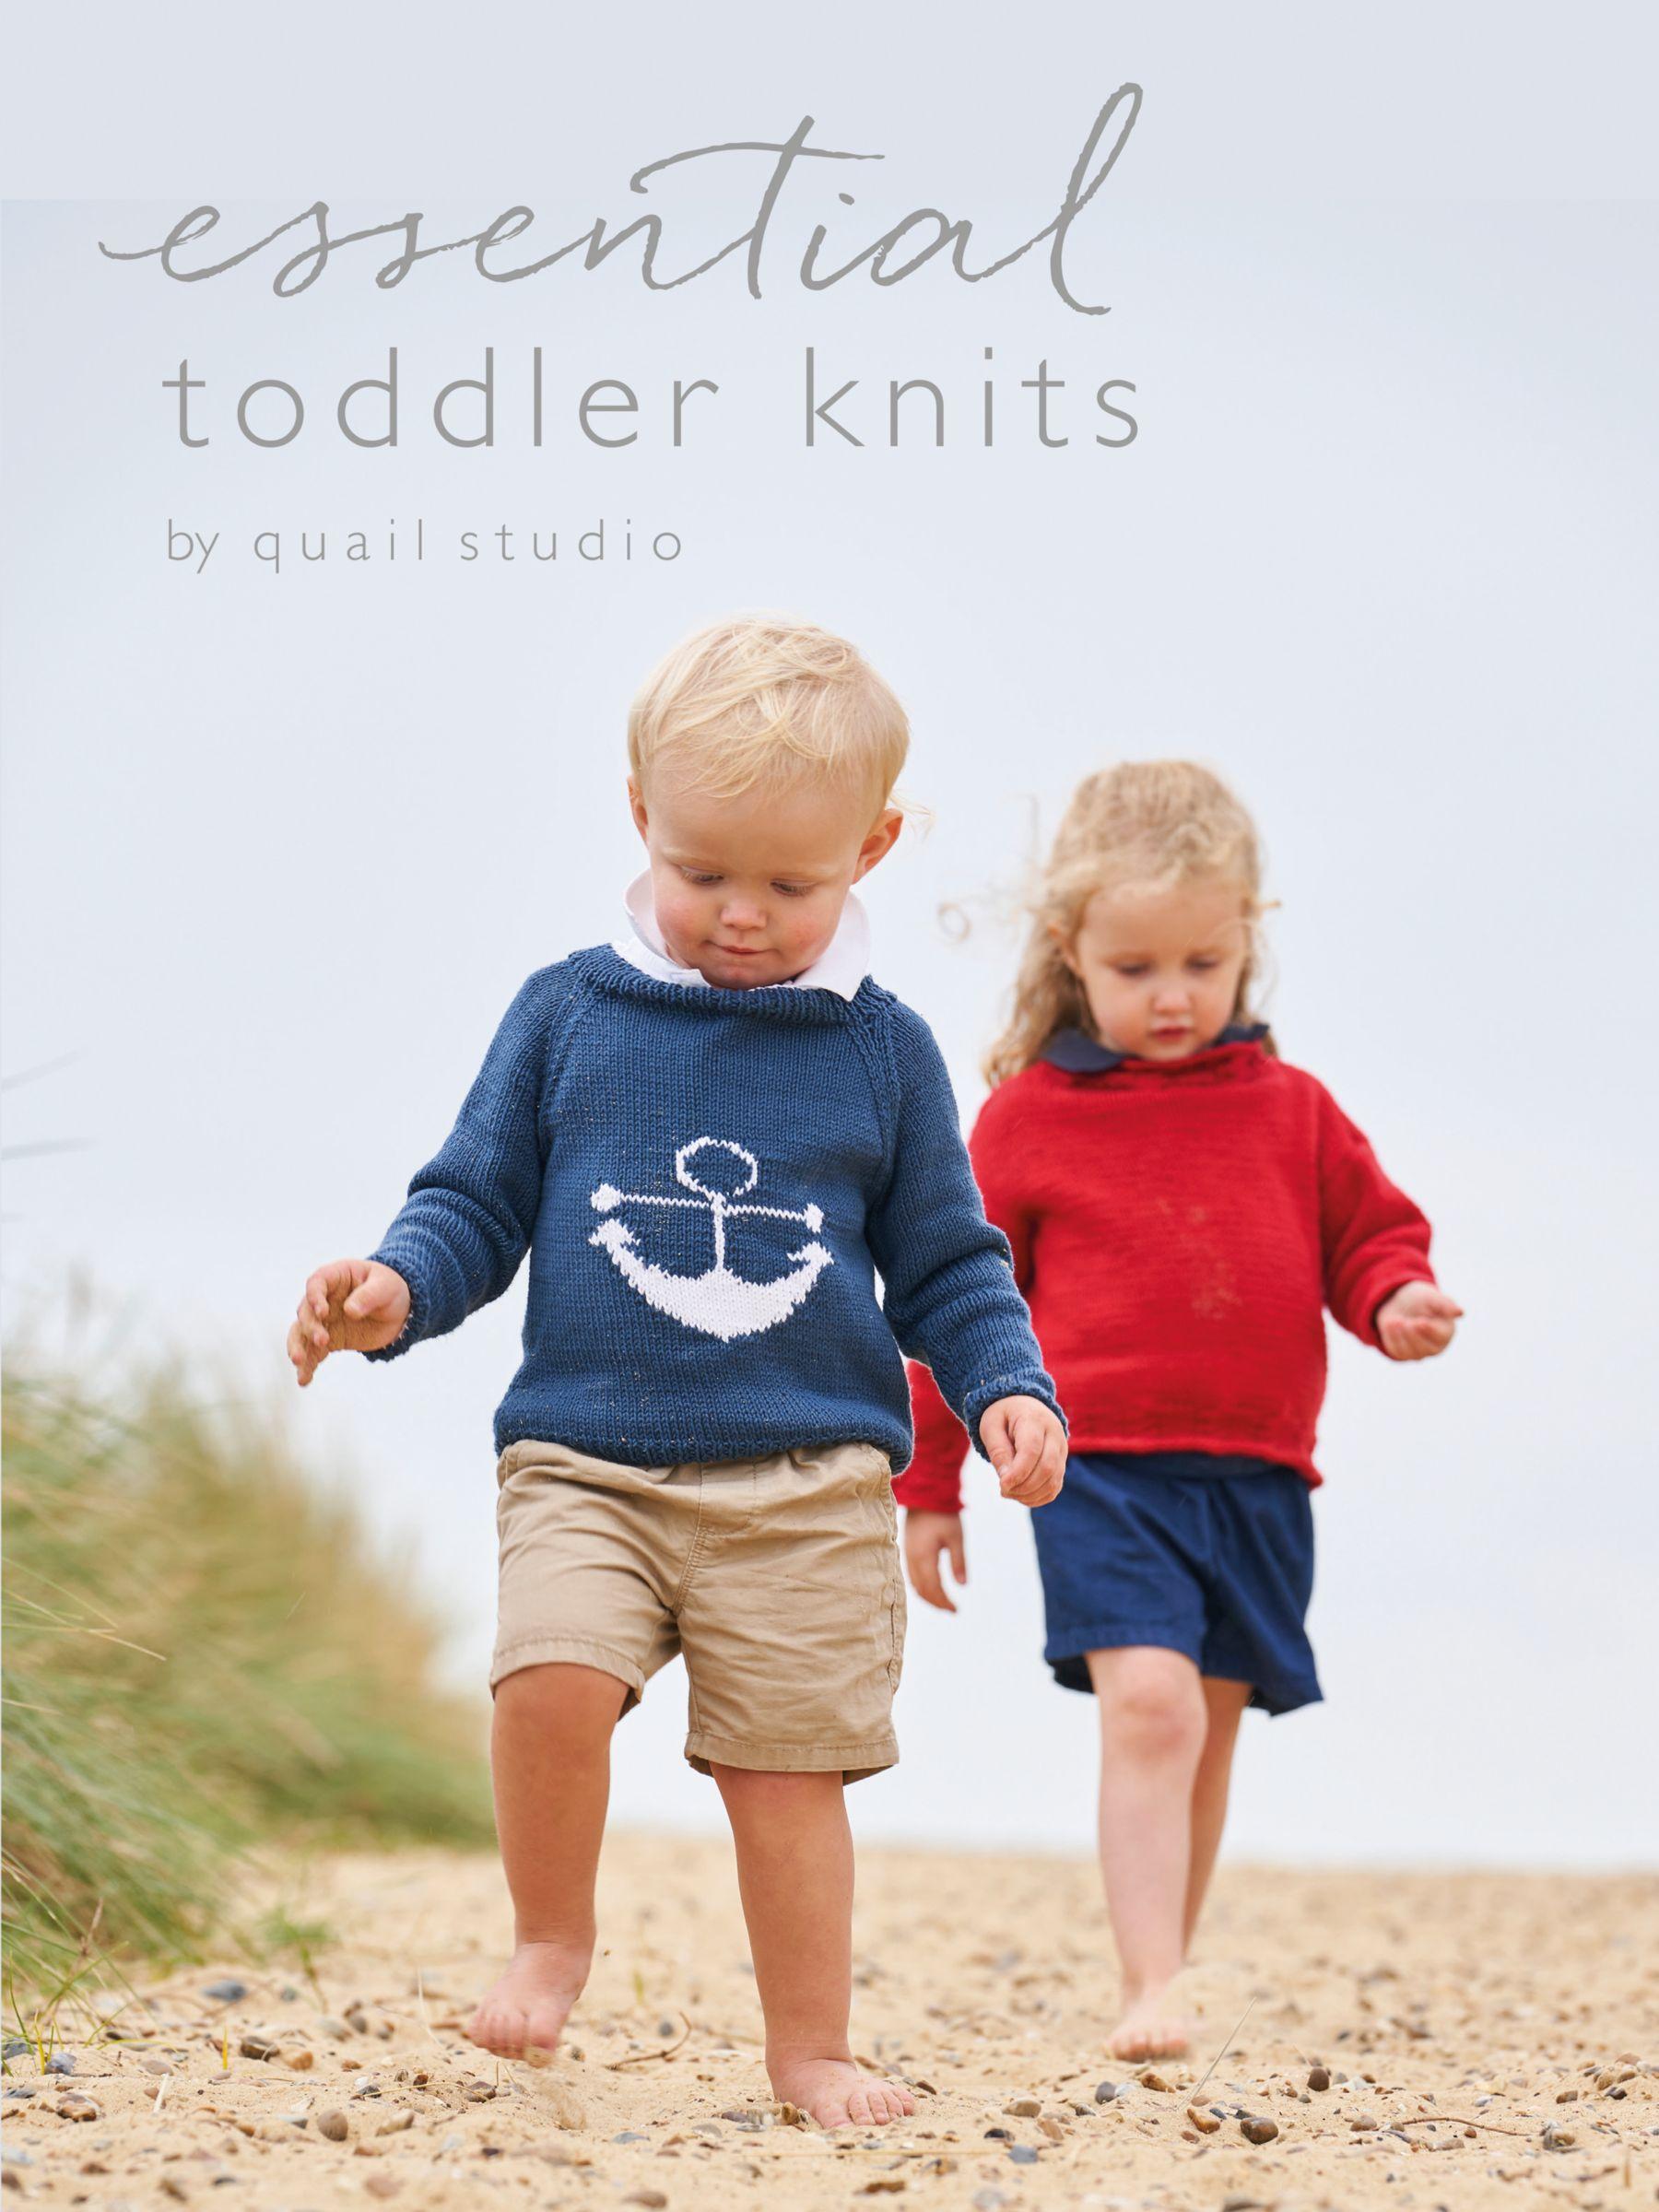 Rowan Rowan Essential Toddler Knits by Quail Studio Knitting Book